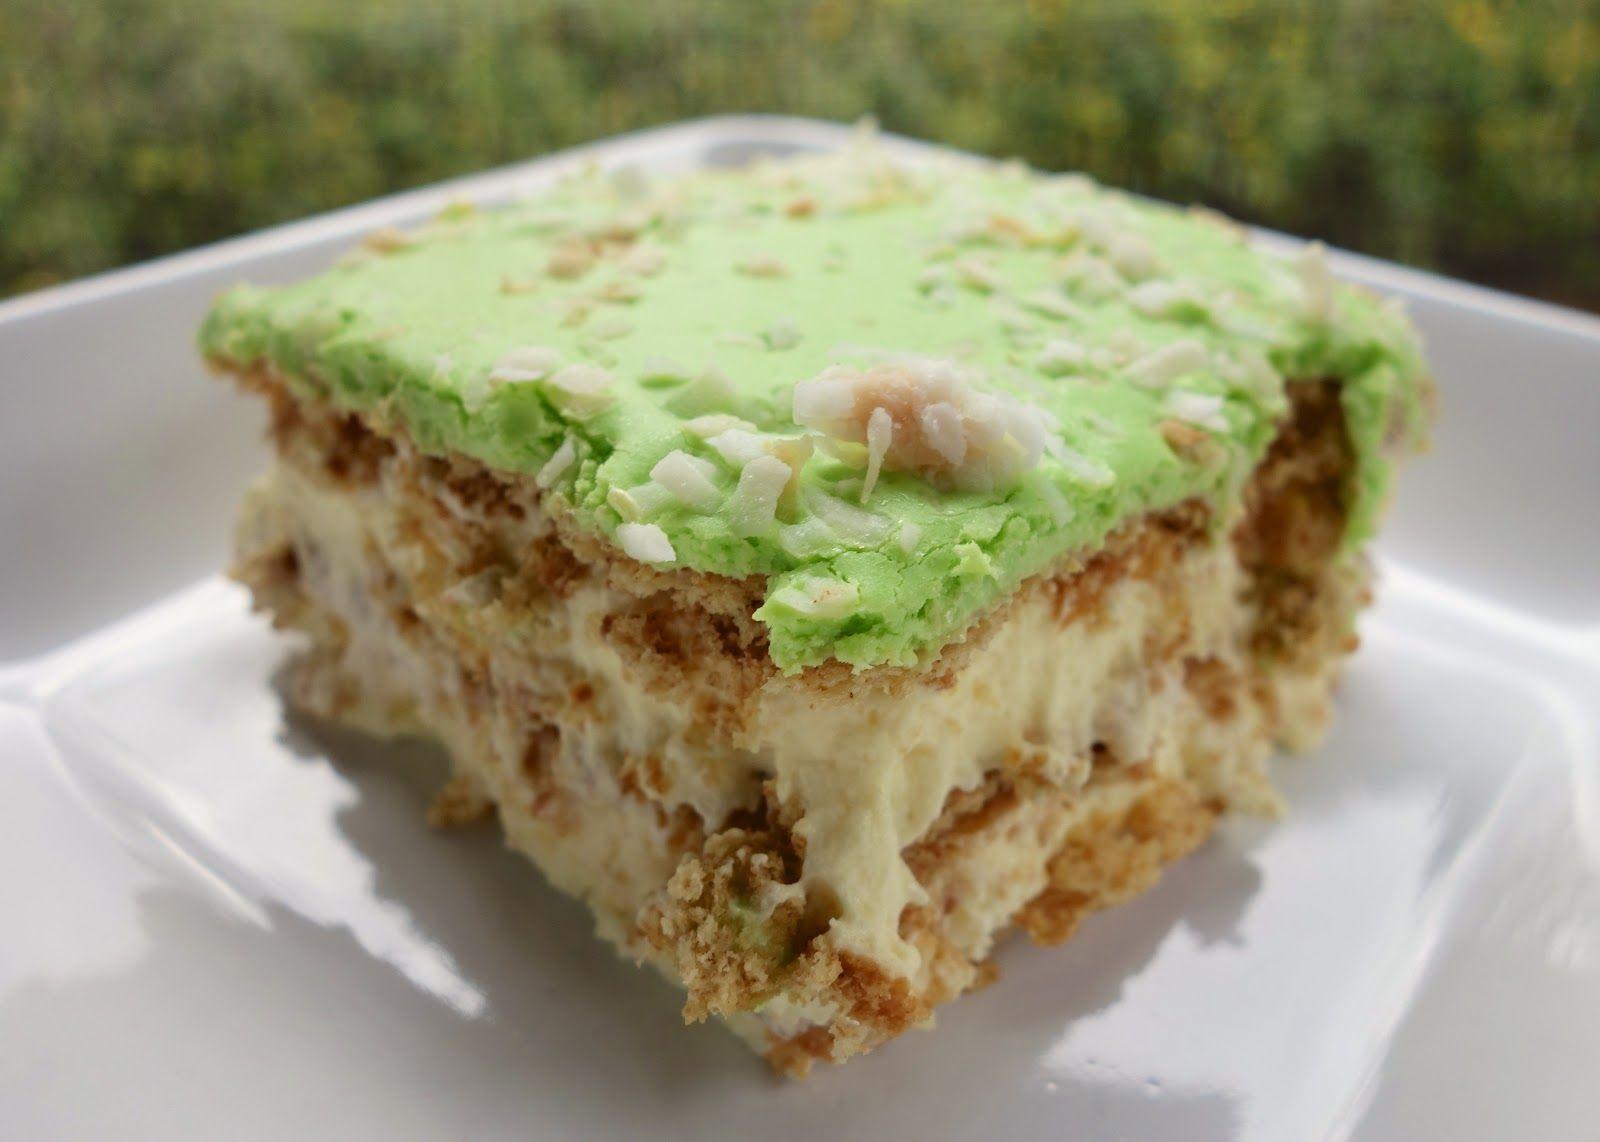 Key lime cake recipe duncan hines